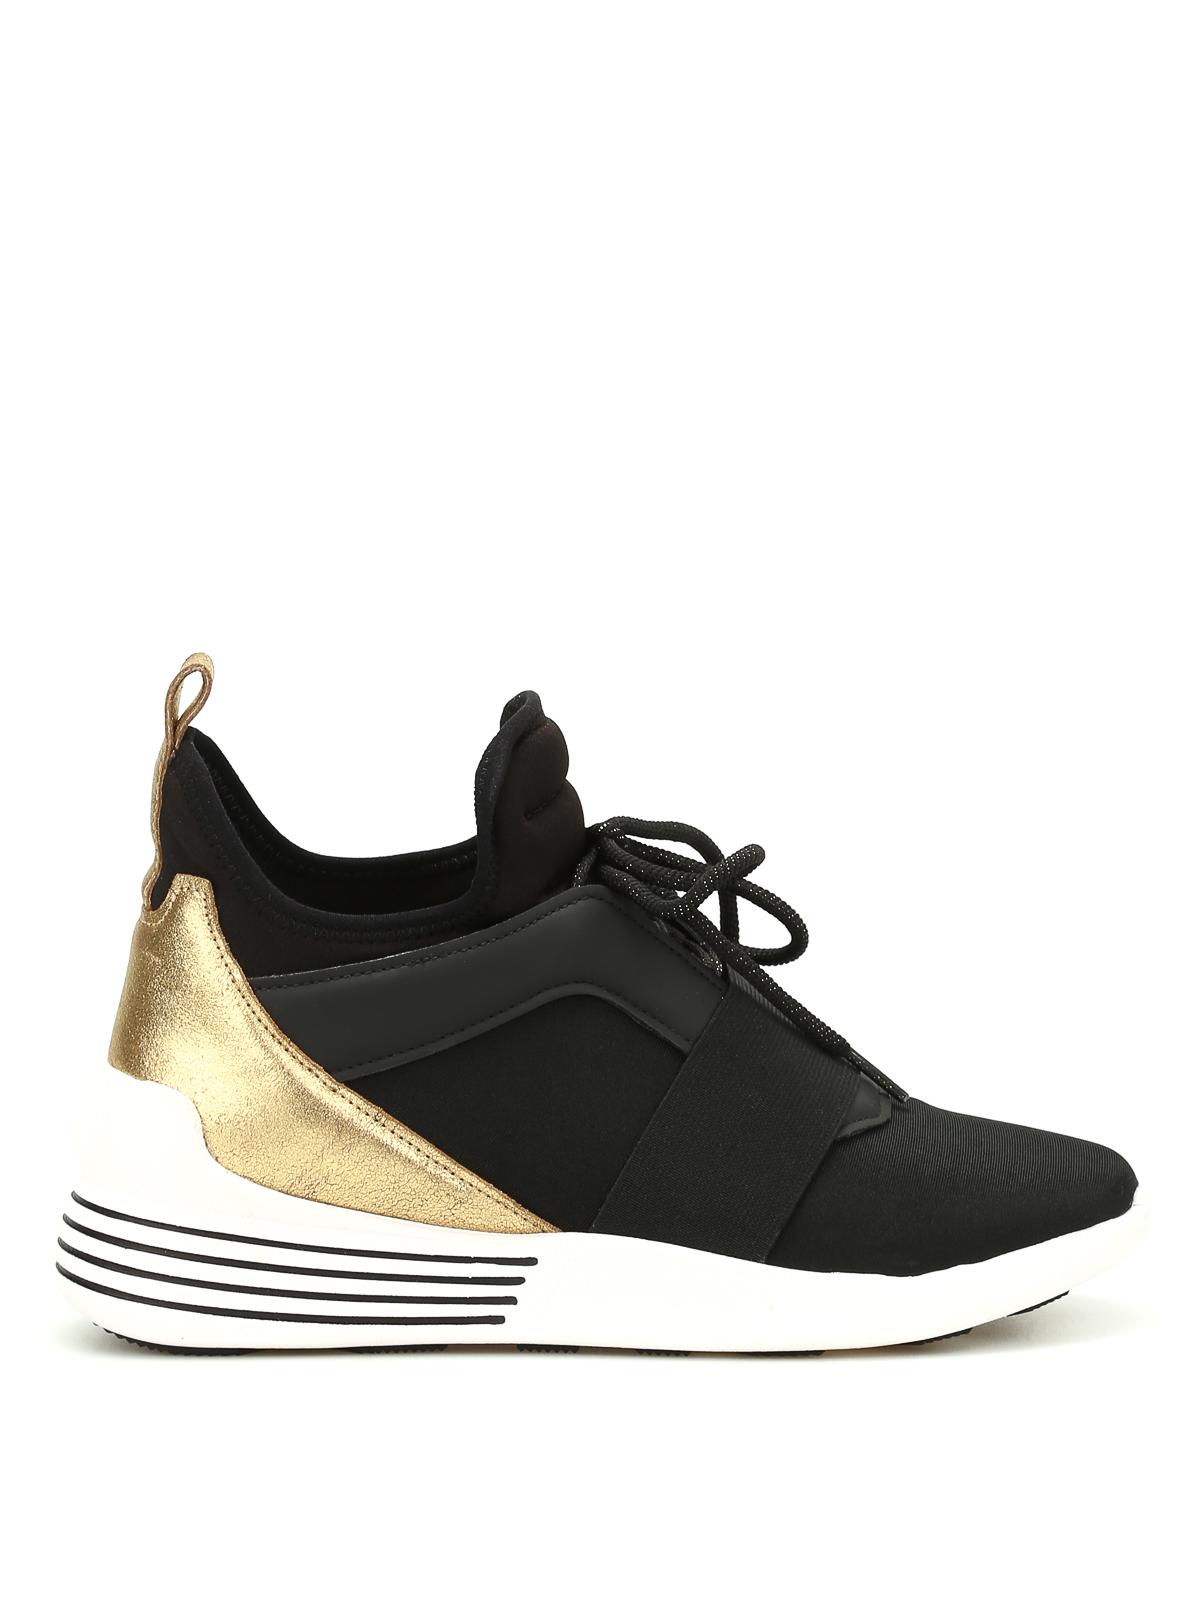 Kendall Kylie Braydin High Top Neoprene Sneakers